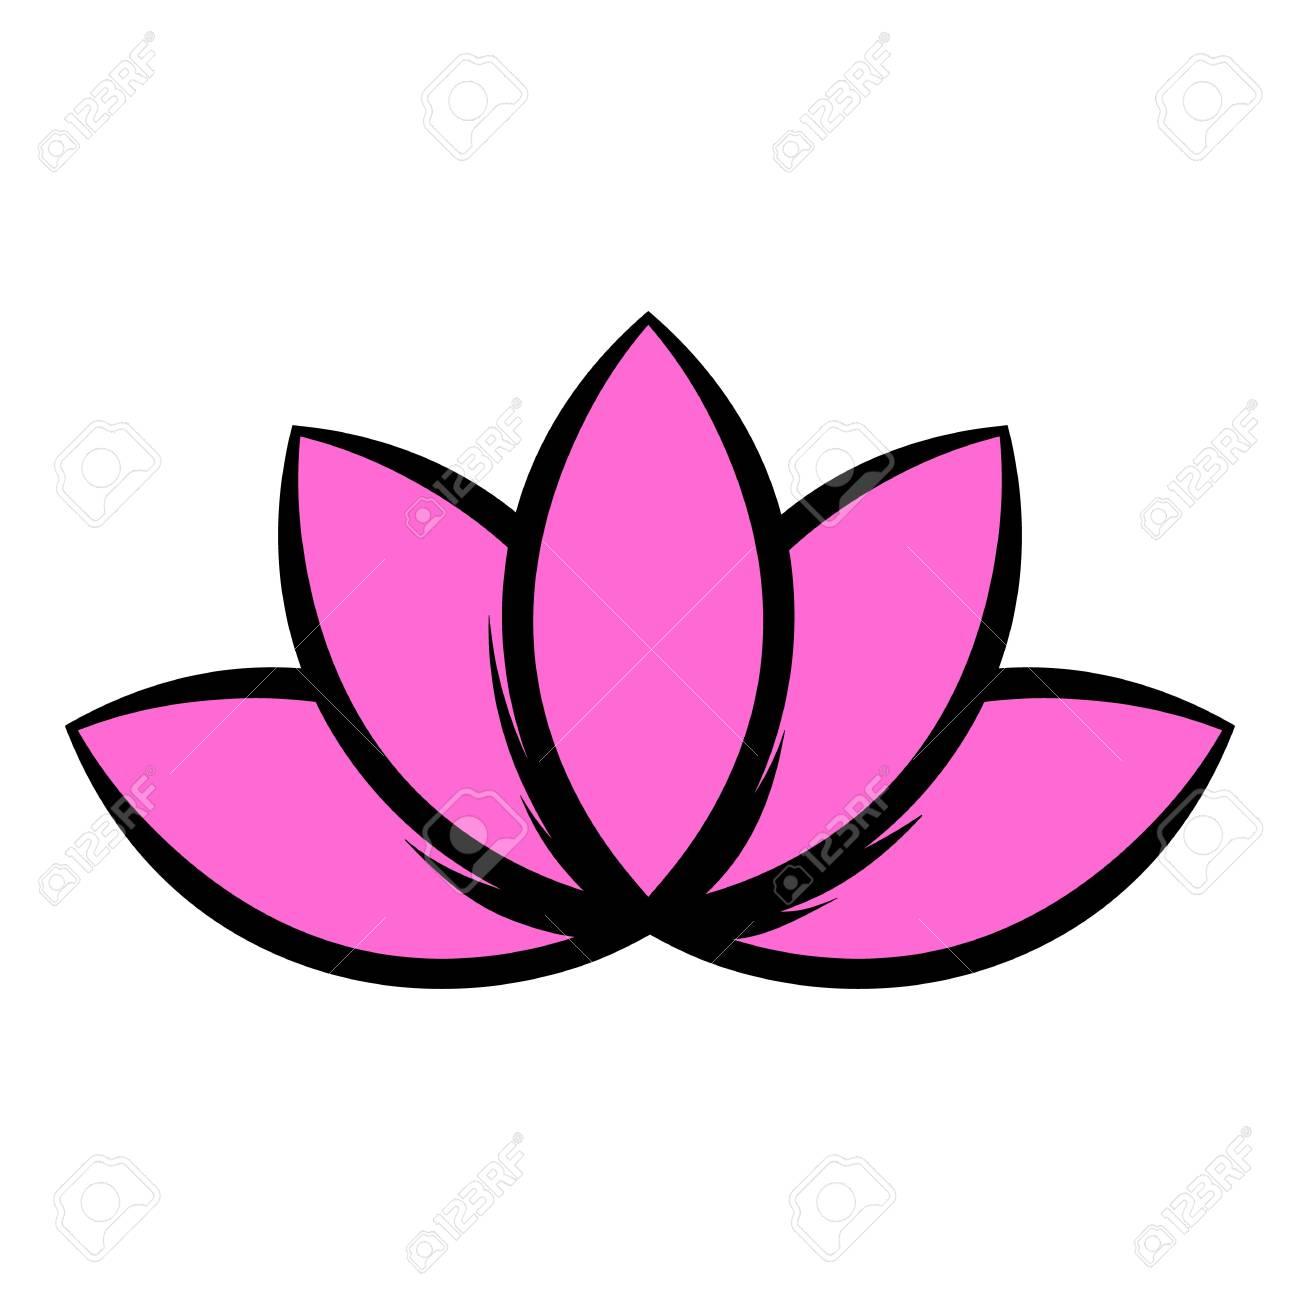 Lotus Flower Icon Icon Cartoon Royalty Free Cliparts Vectors And